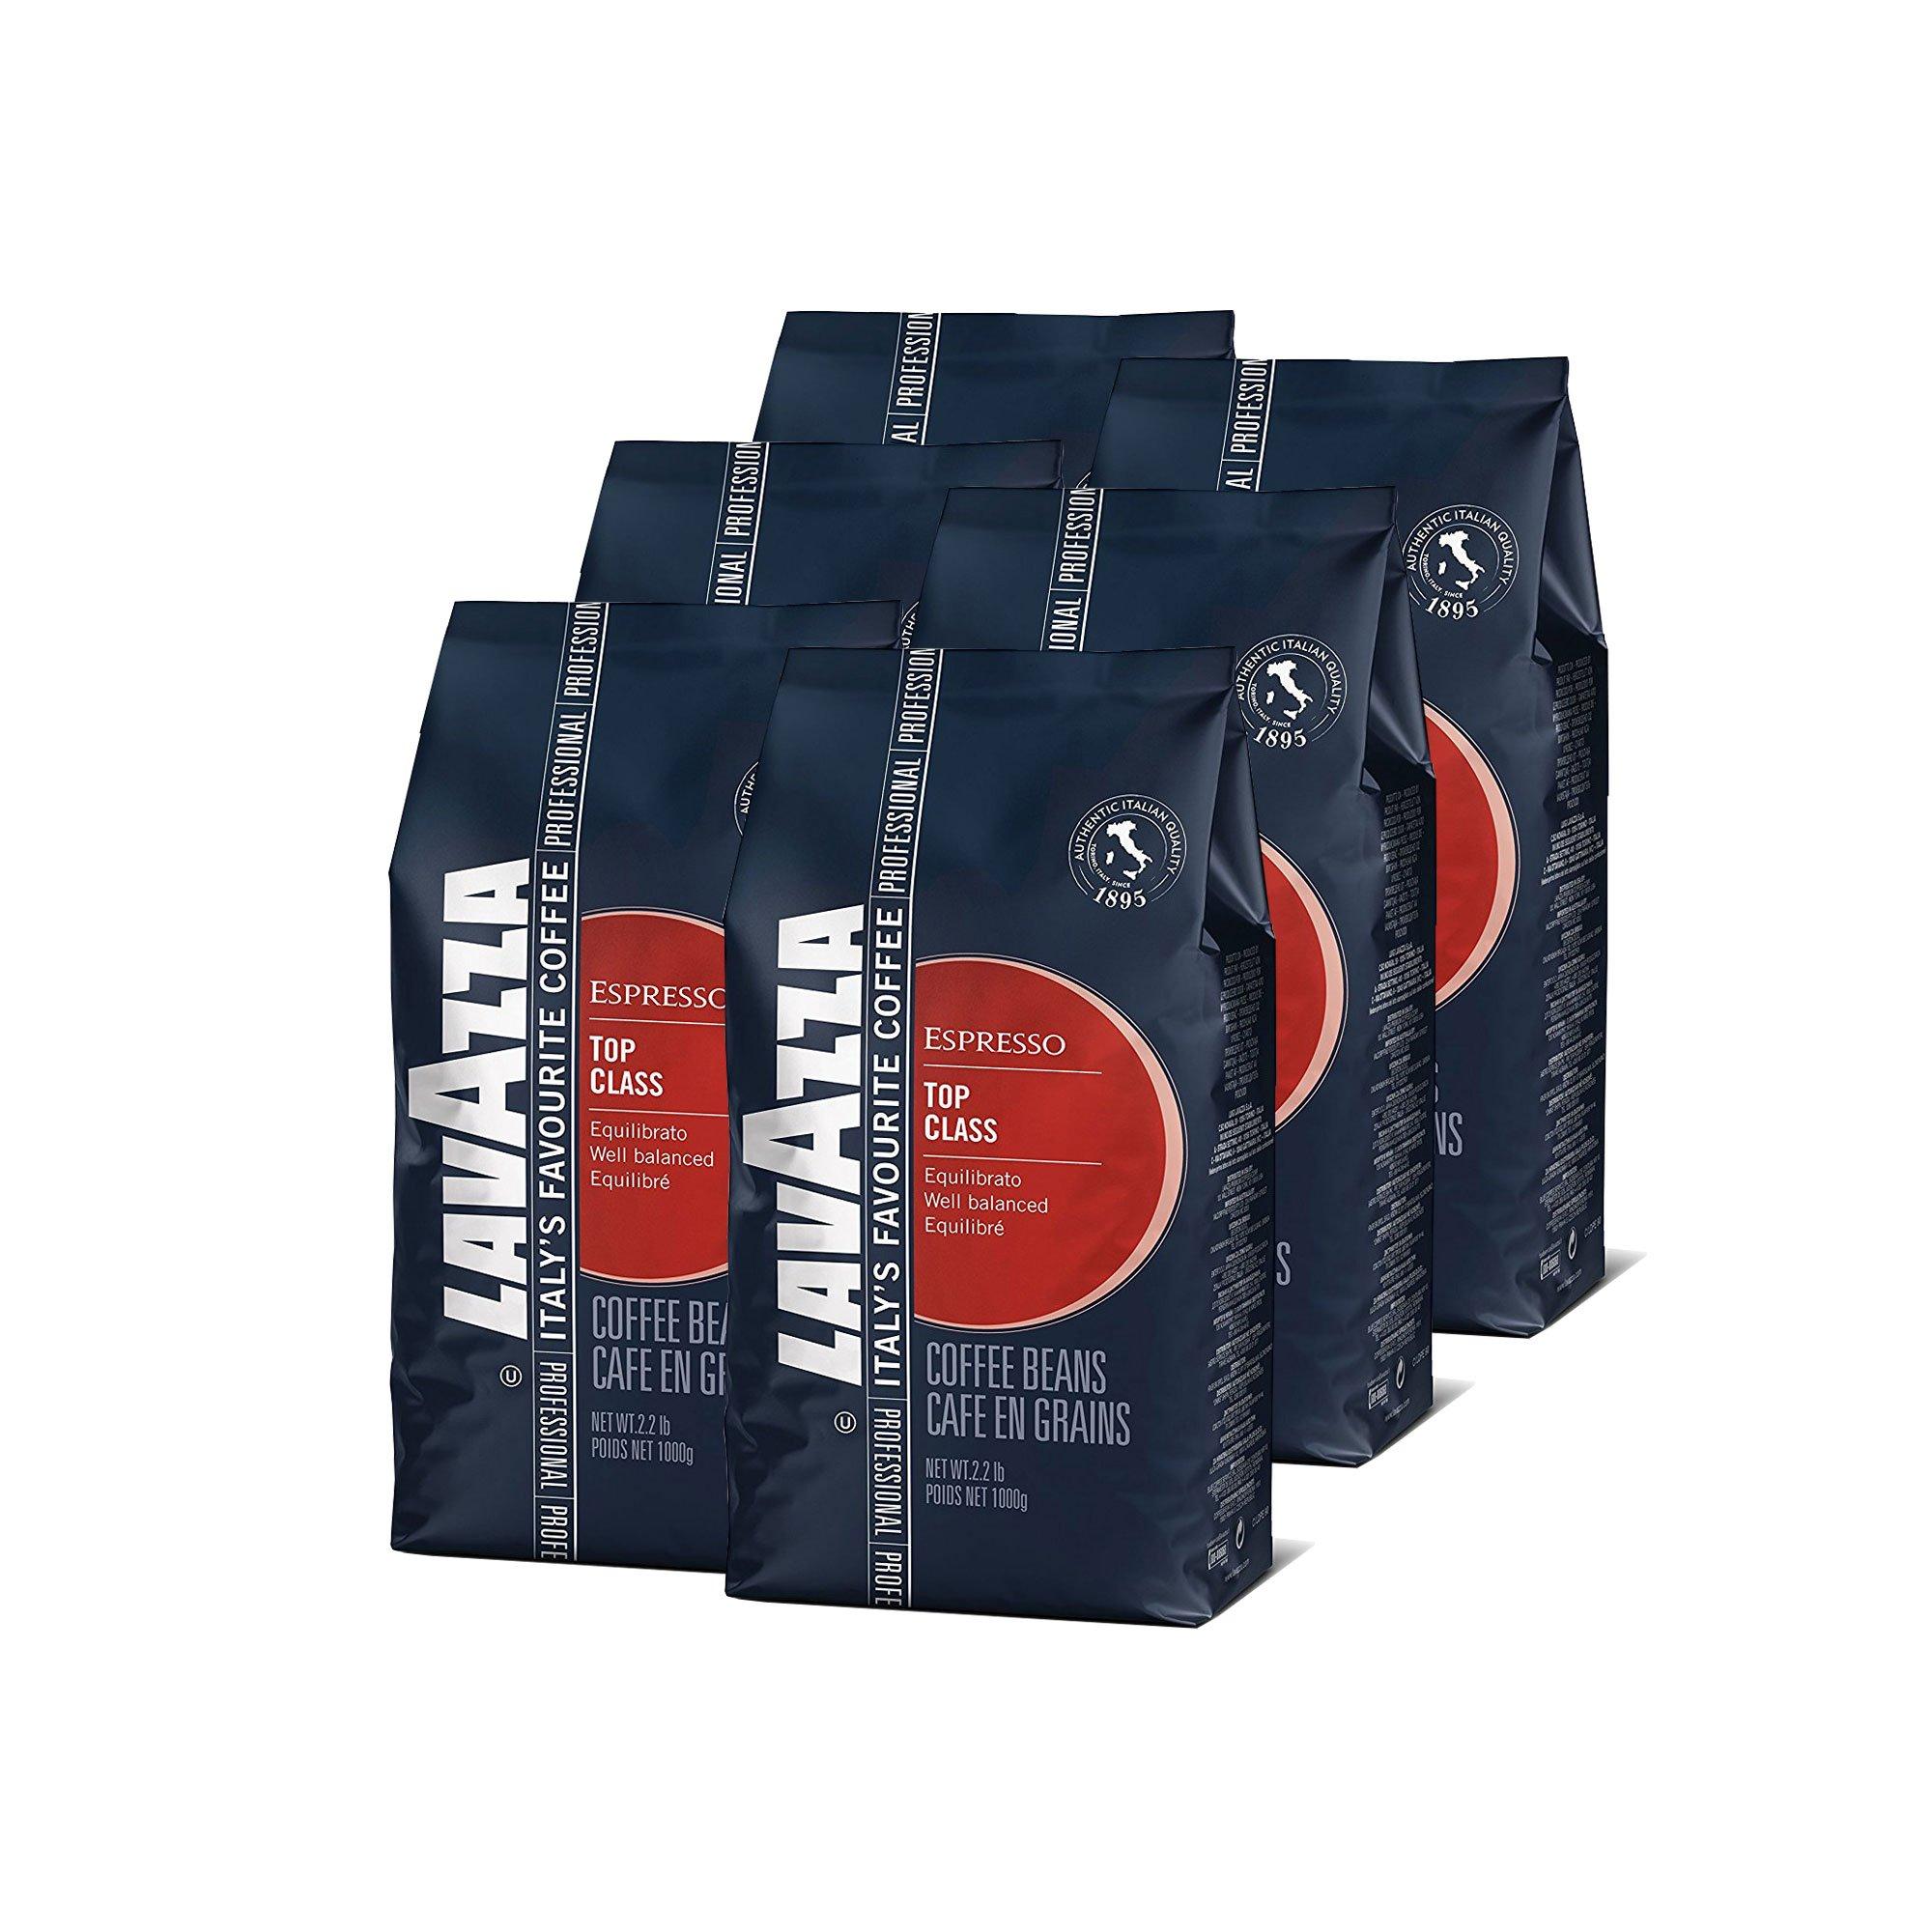 Lavazza Top Class Whole Bean Coffee Blend, Medium Espresso Roast, 2.2 Pound, 6 Count by Lavazza (Image #2)